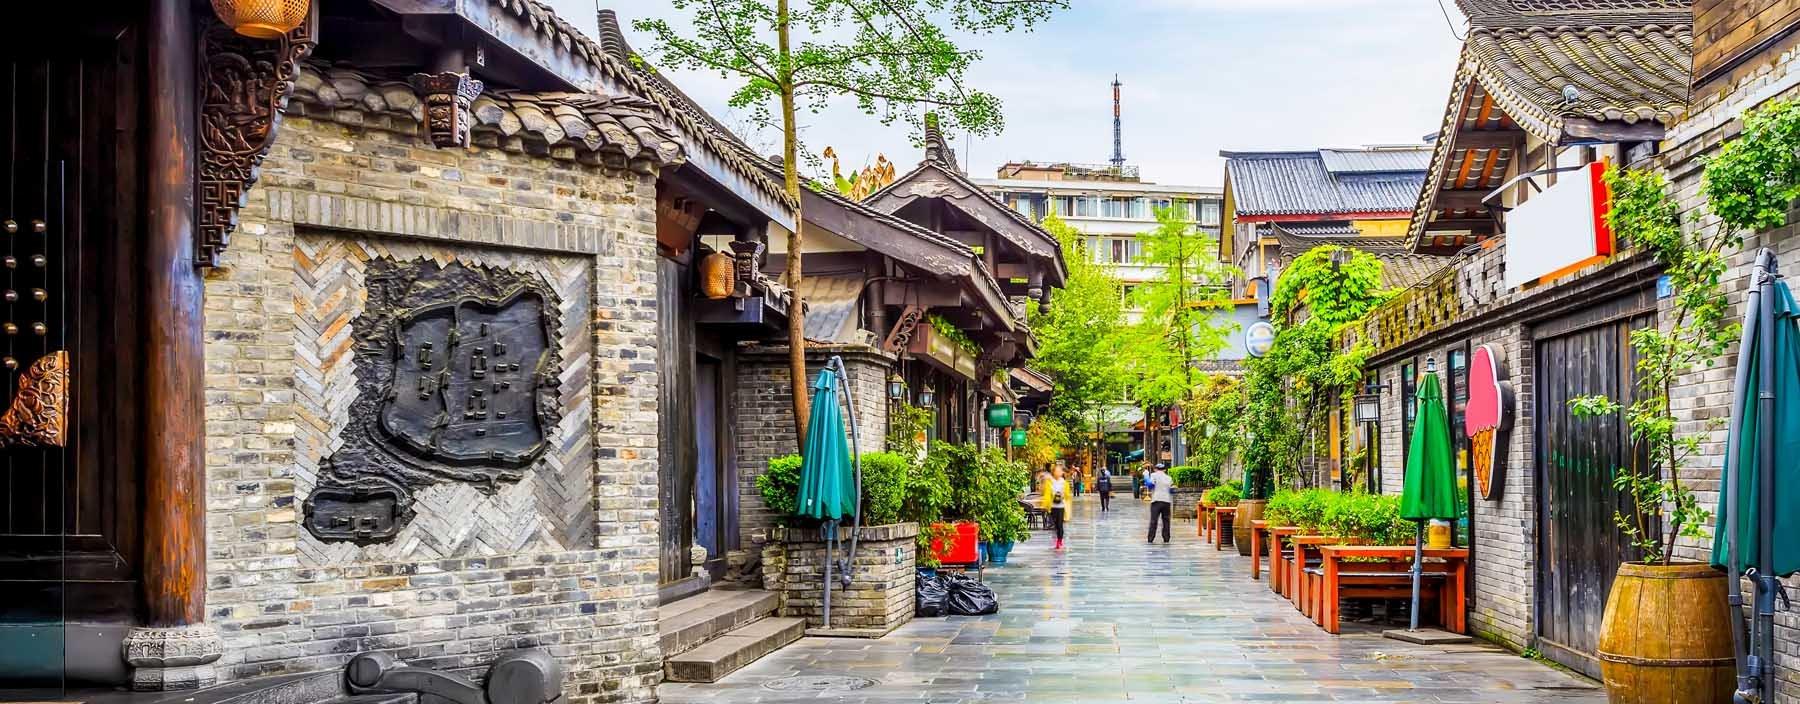 cn, chengdu, oude stad (4).jpg